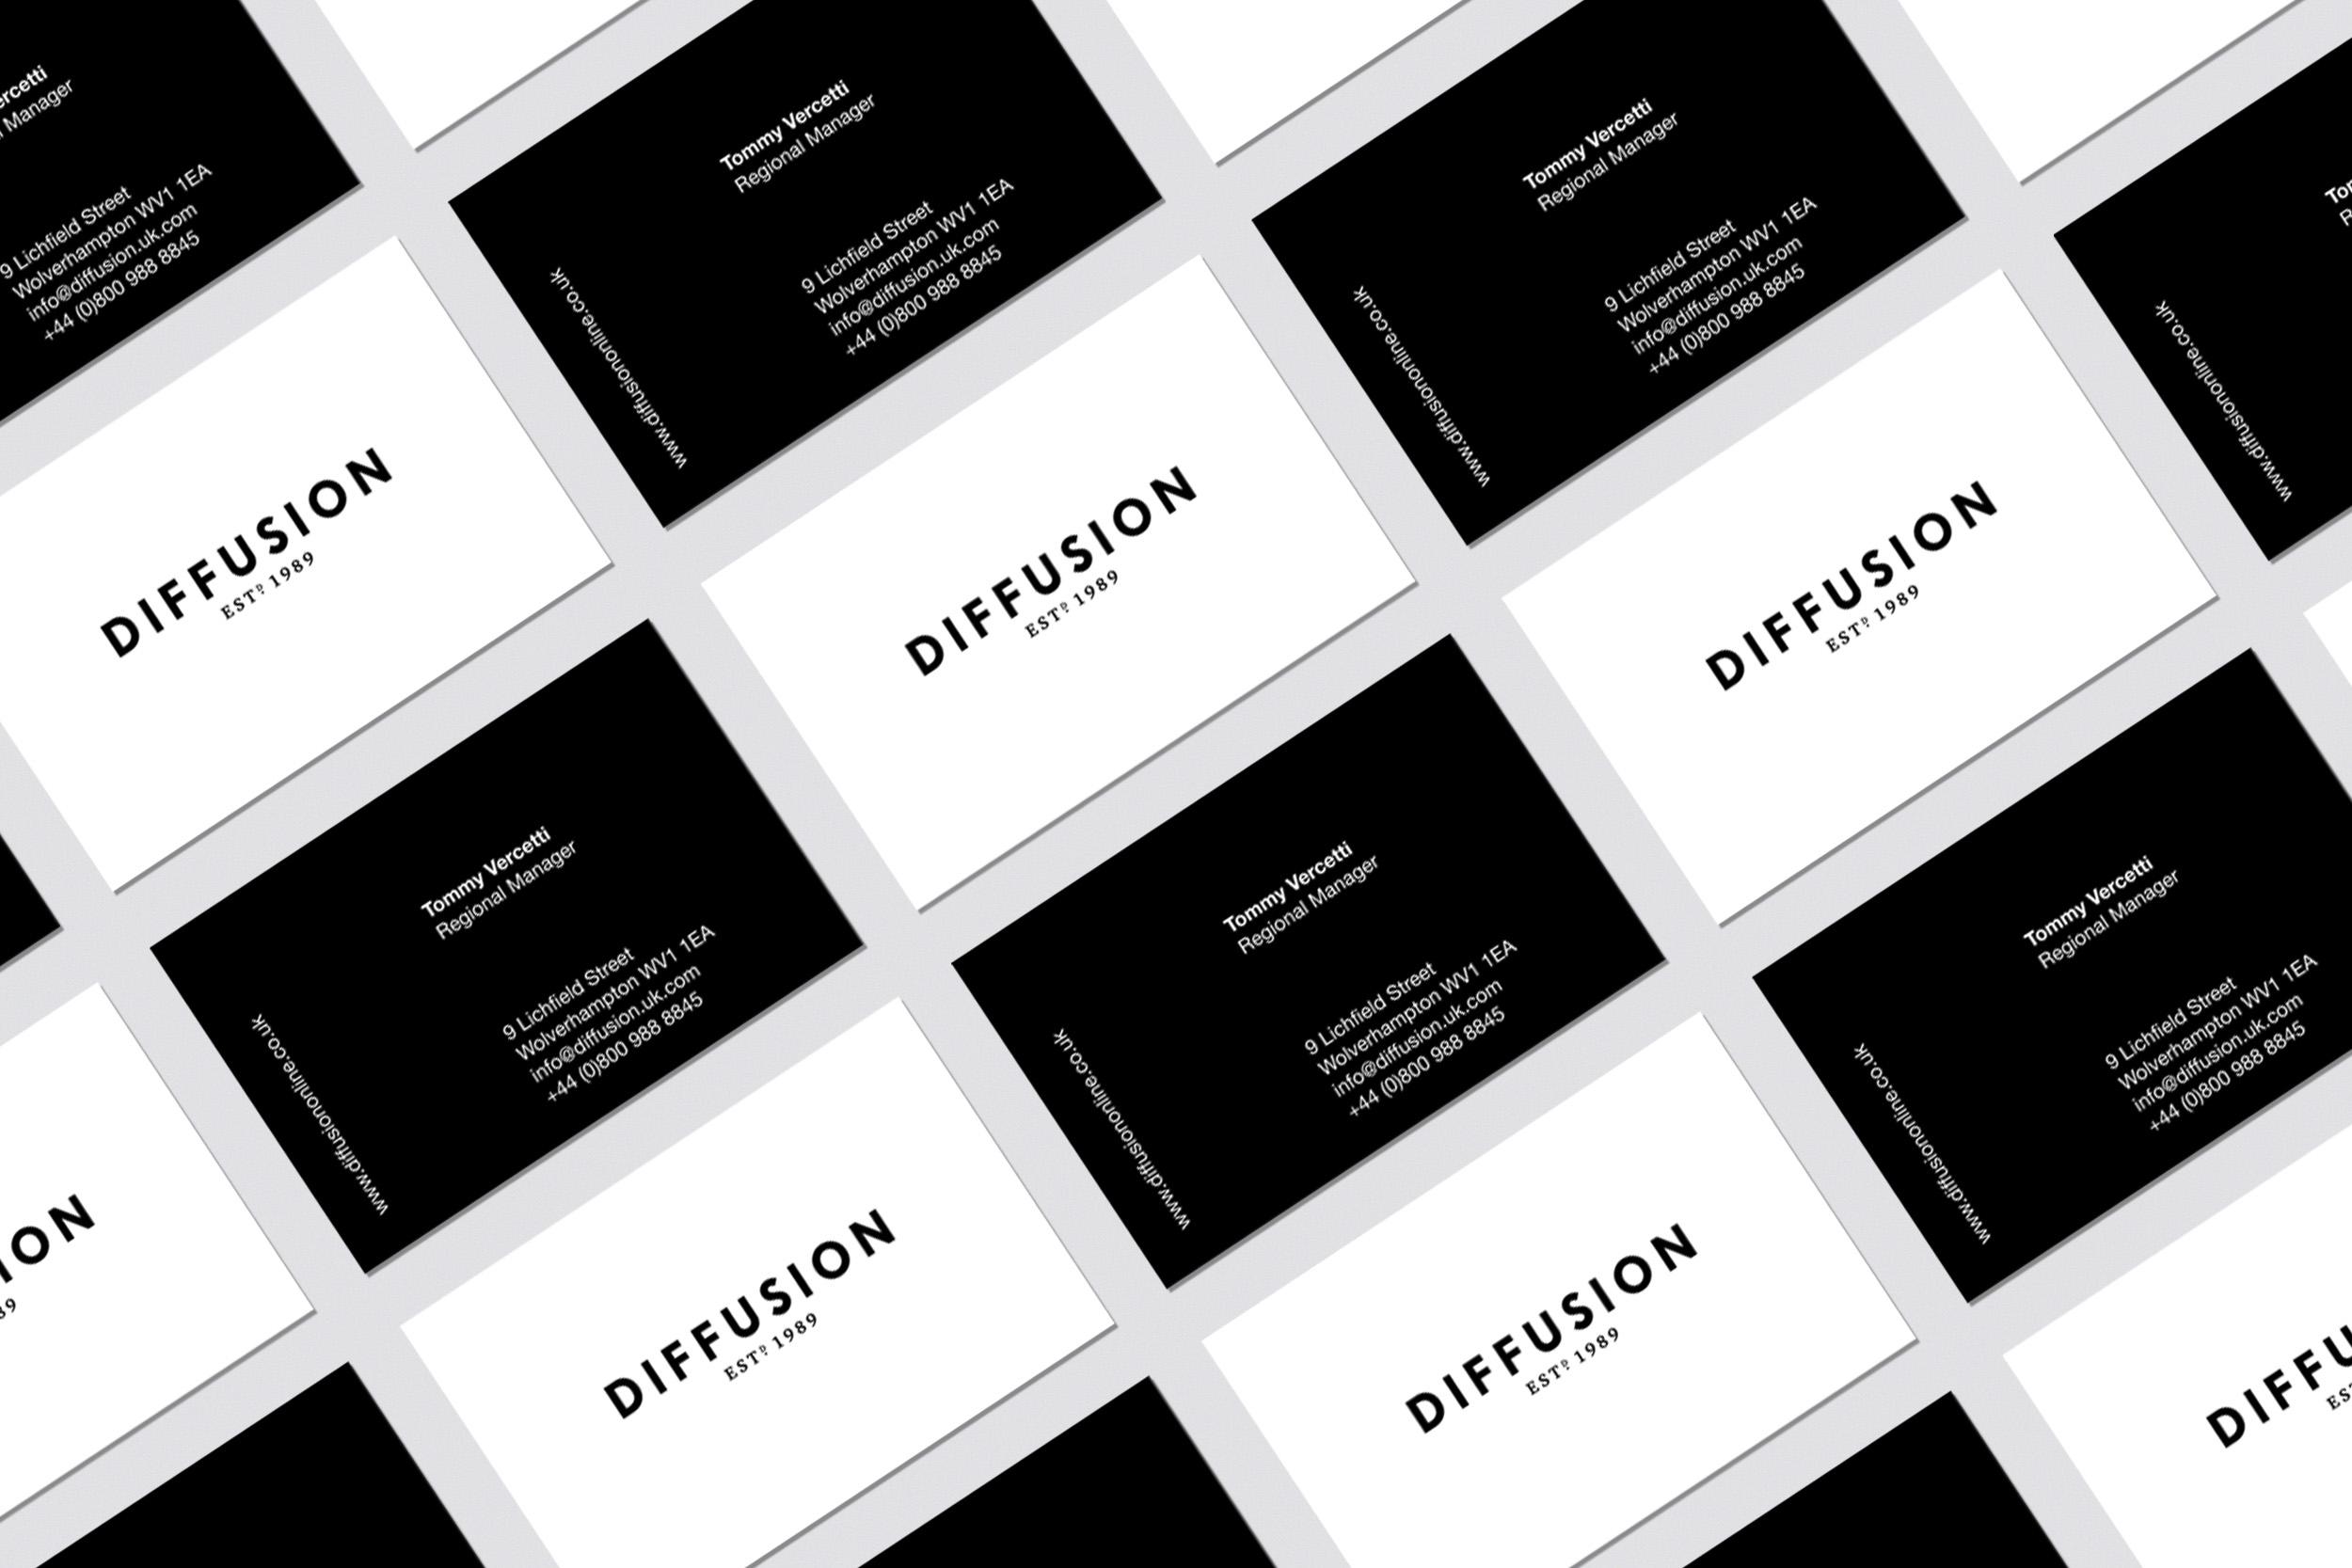 Diffusion - Branding / Design / Packaging / Photography / Social Media